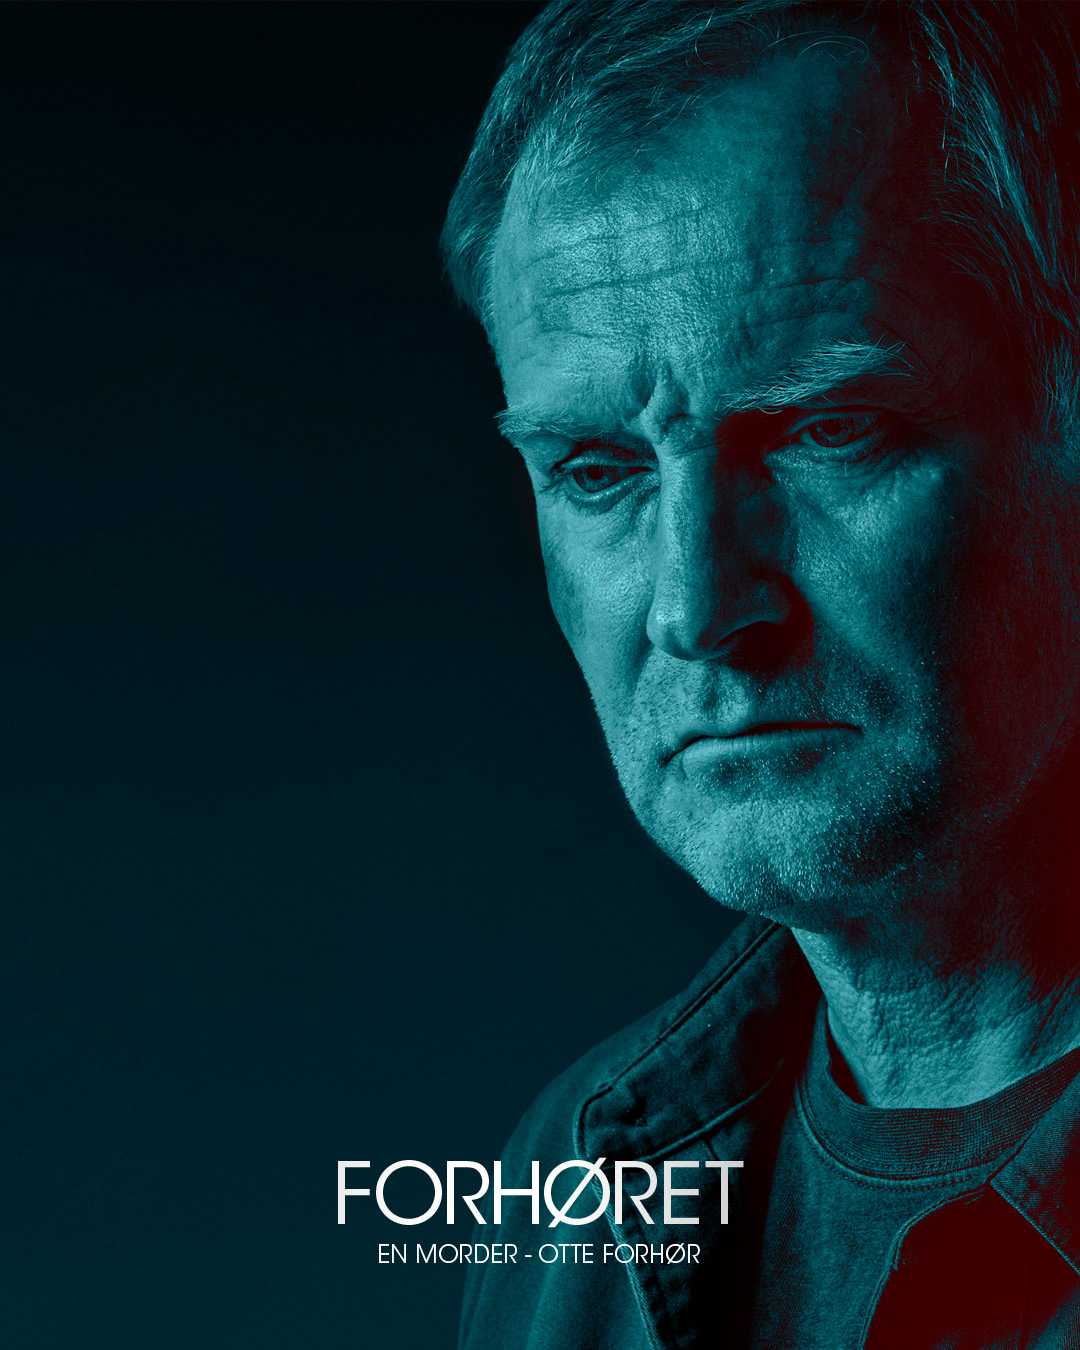 f2_portrait_character_ulrich